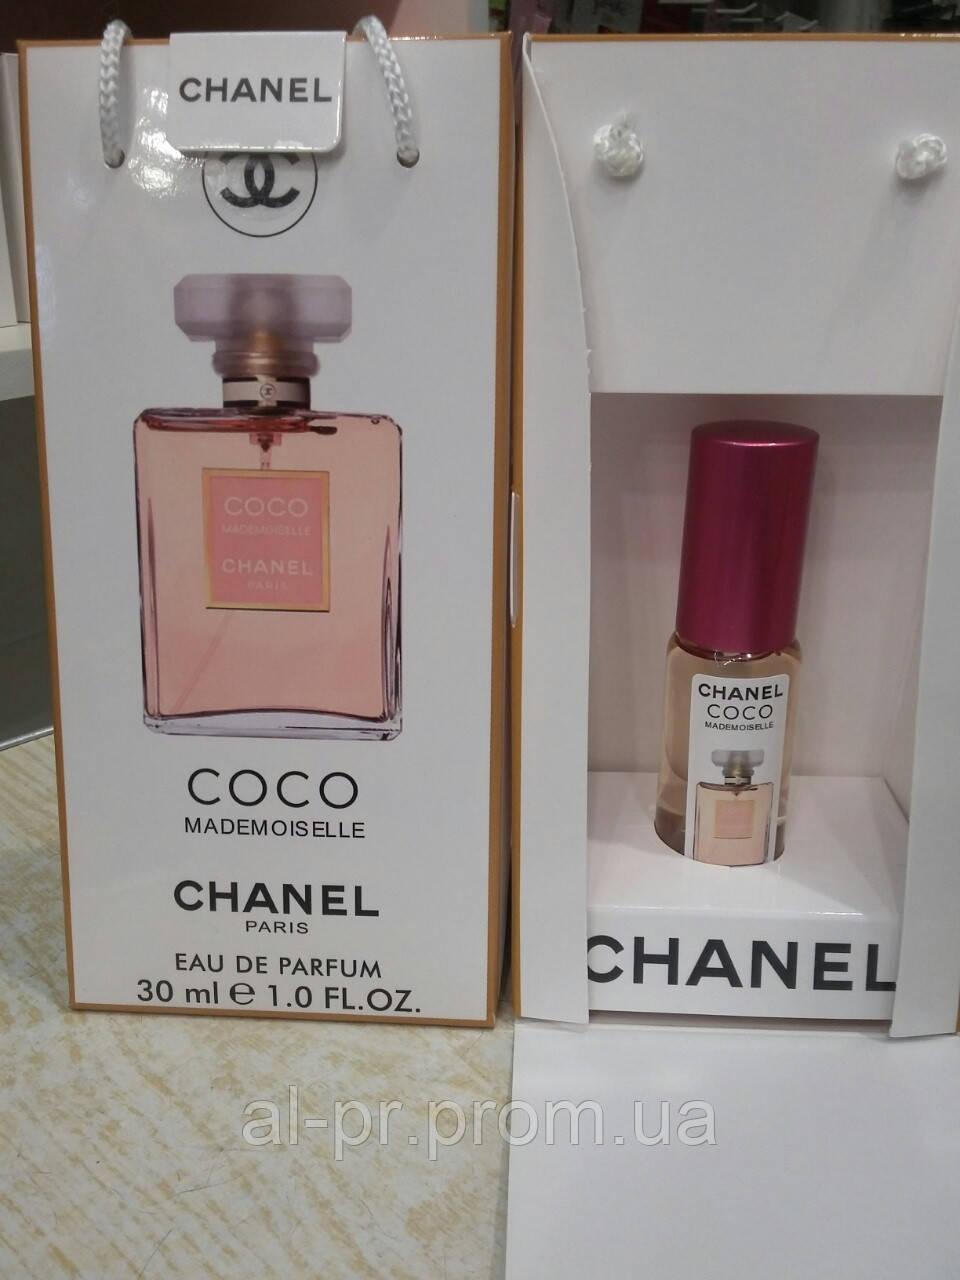 Подарочный набор парфюмерии Chanel Coco Mademoiselle